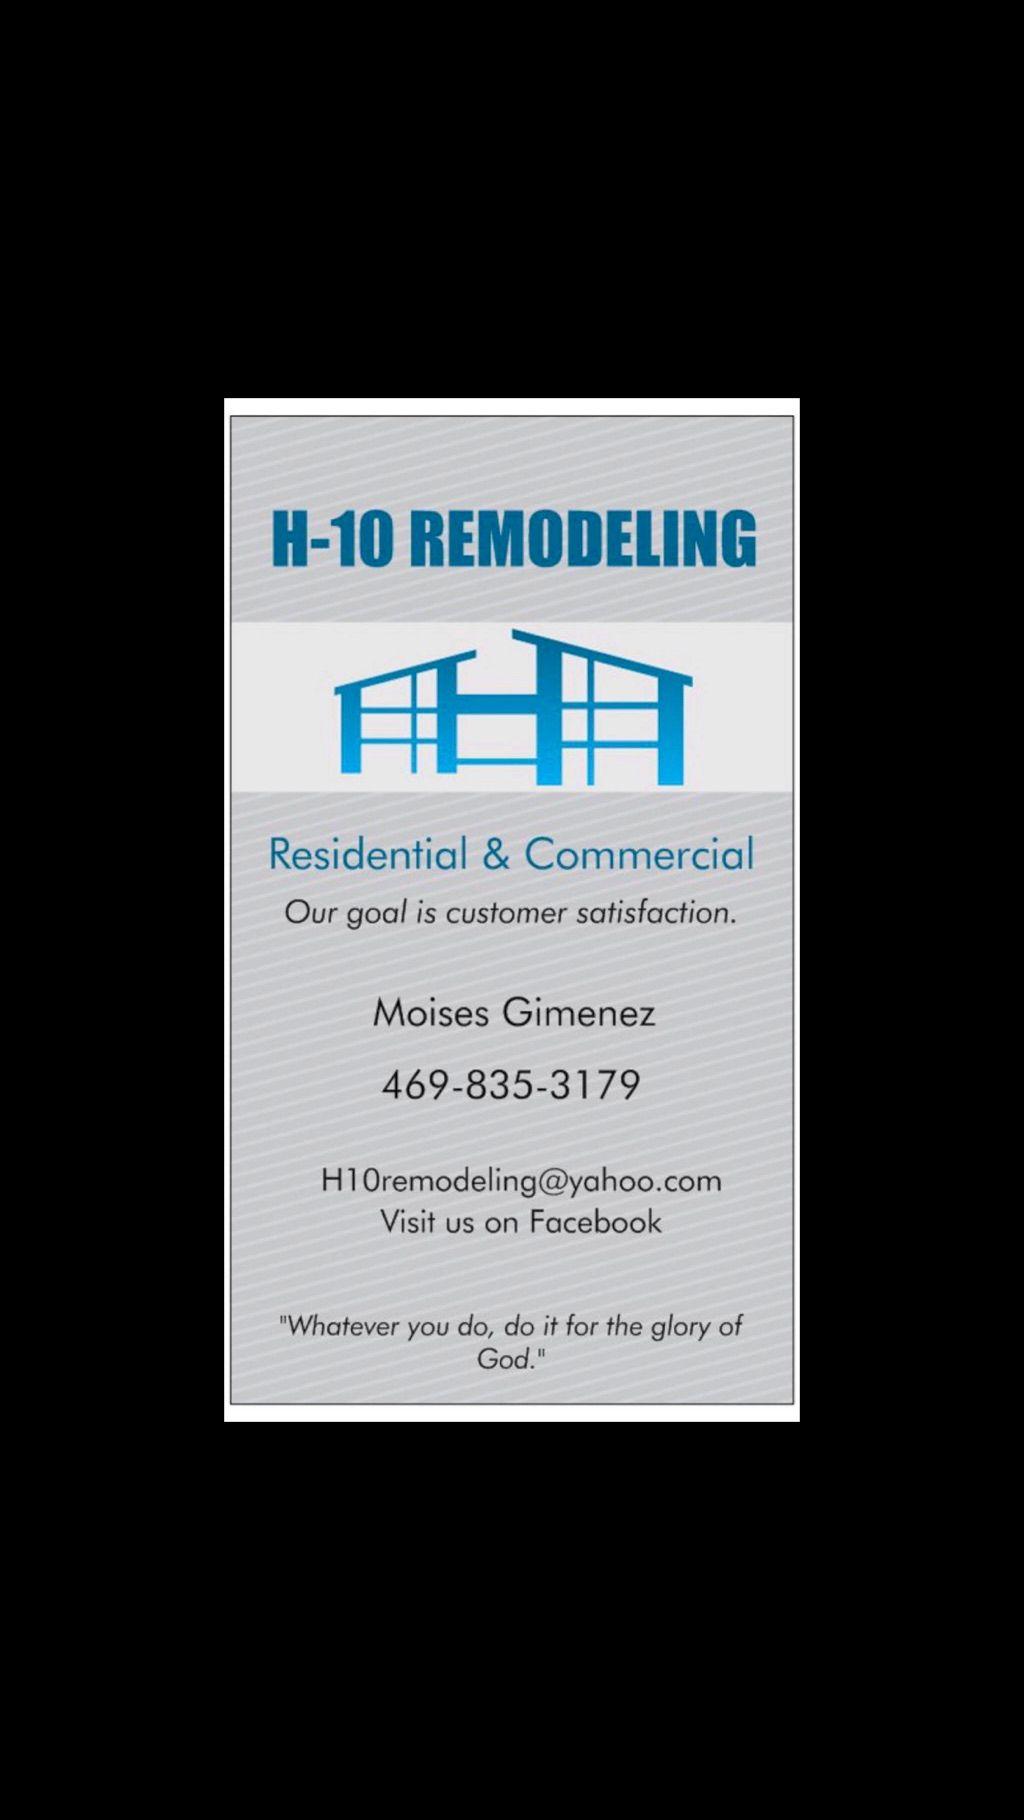 H-10 Remodeling, LLC,